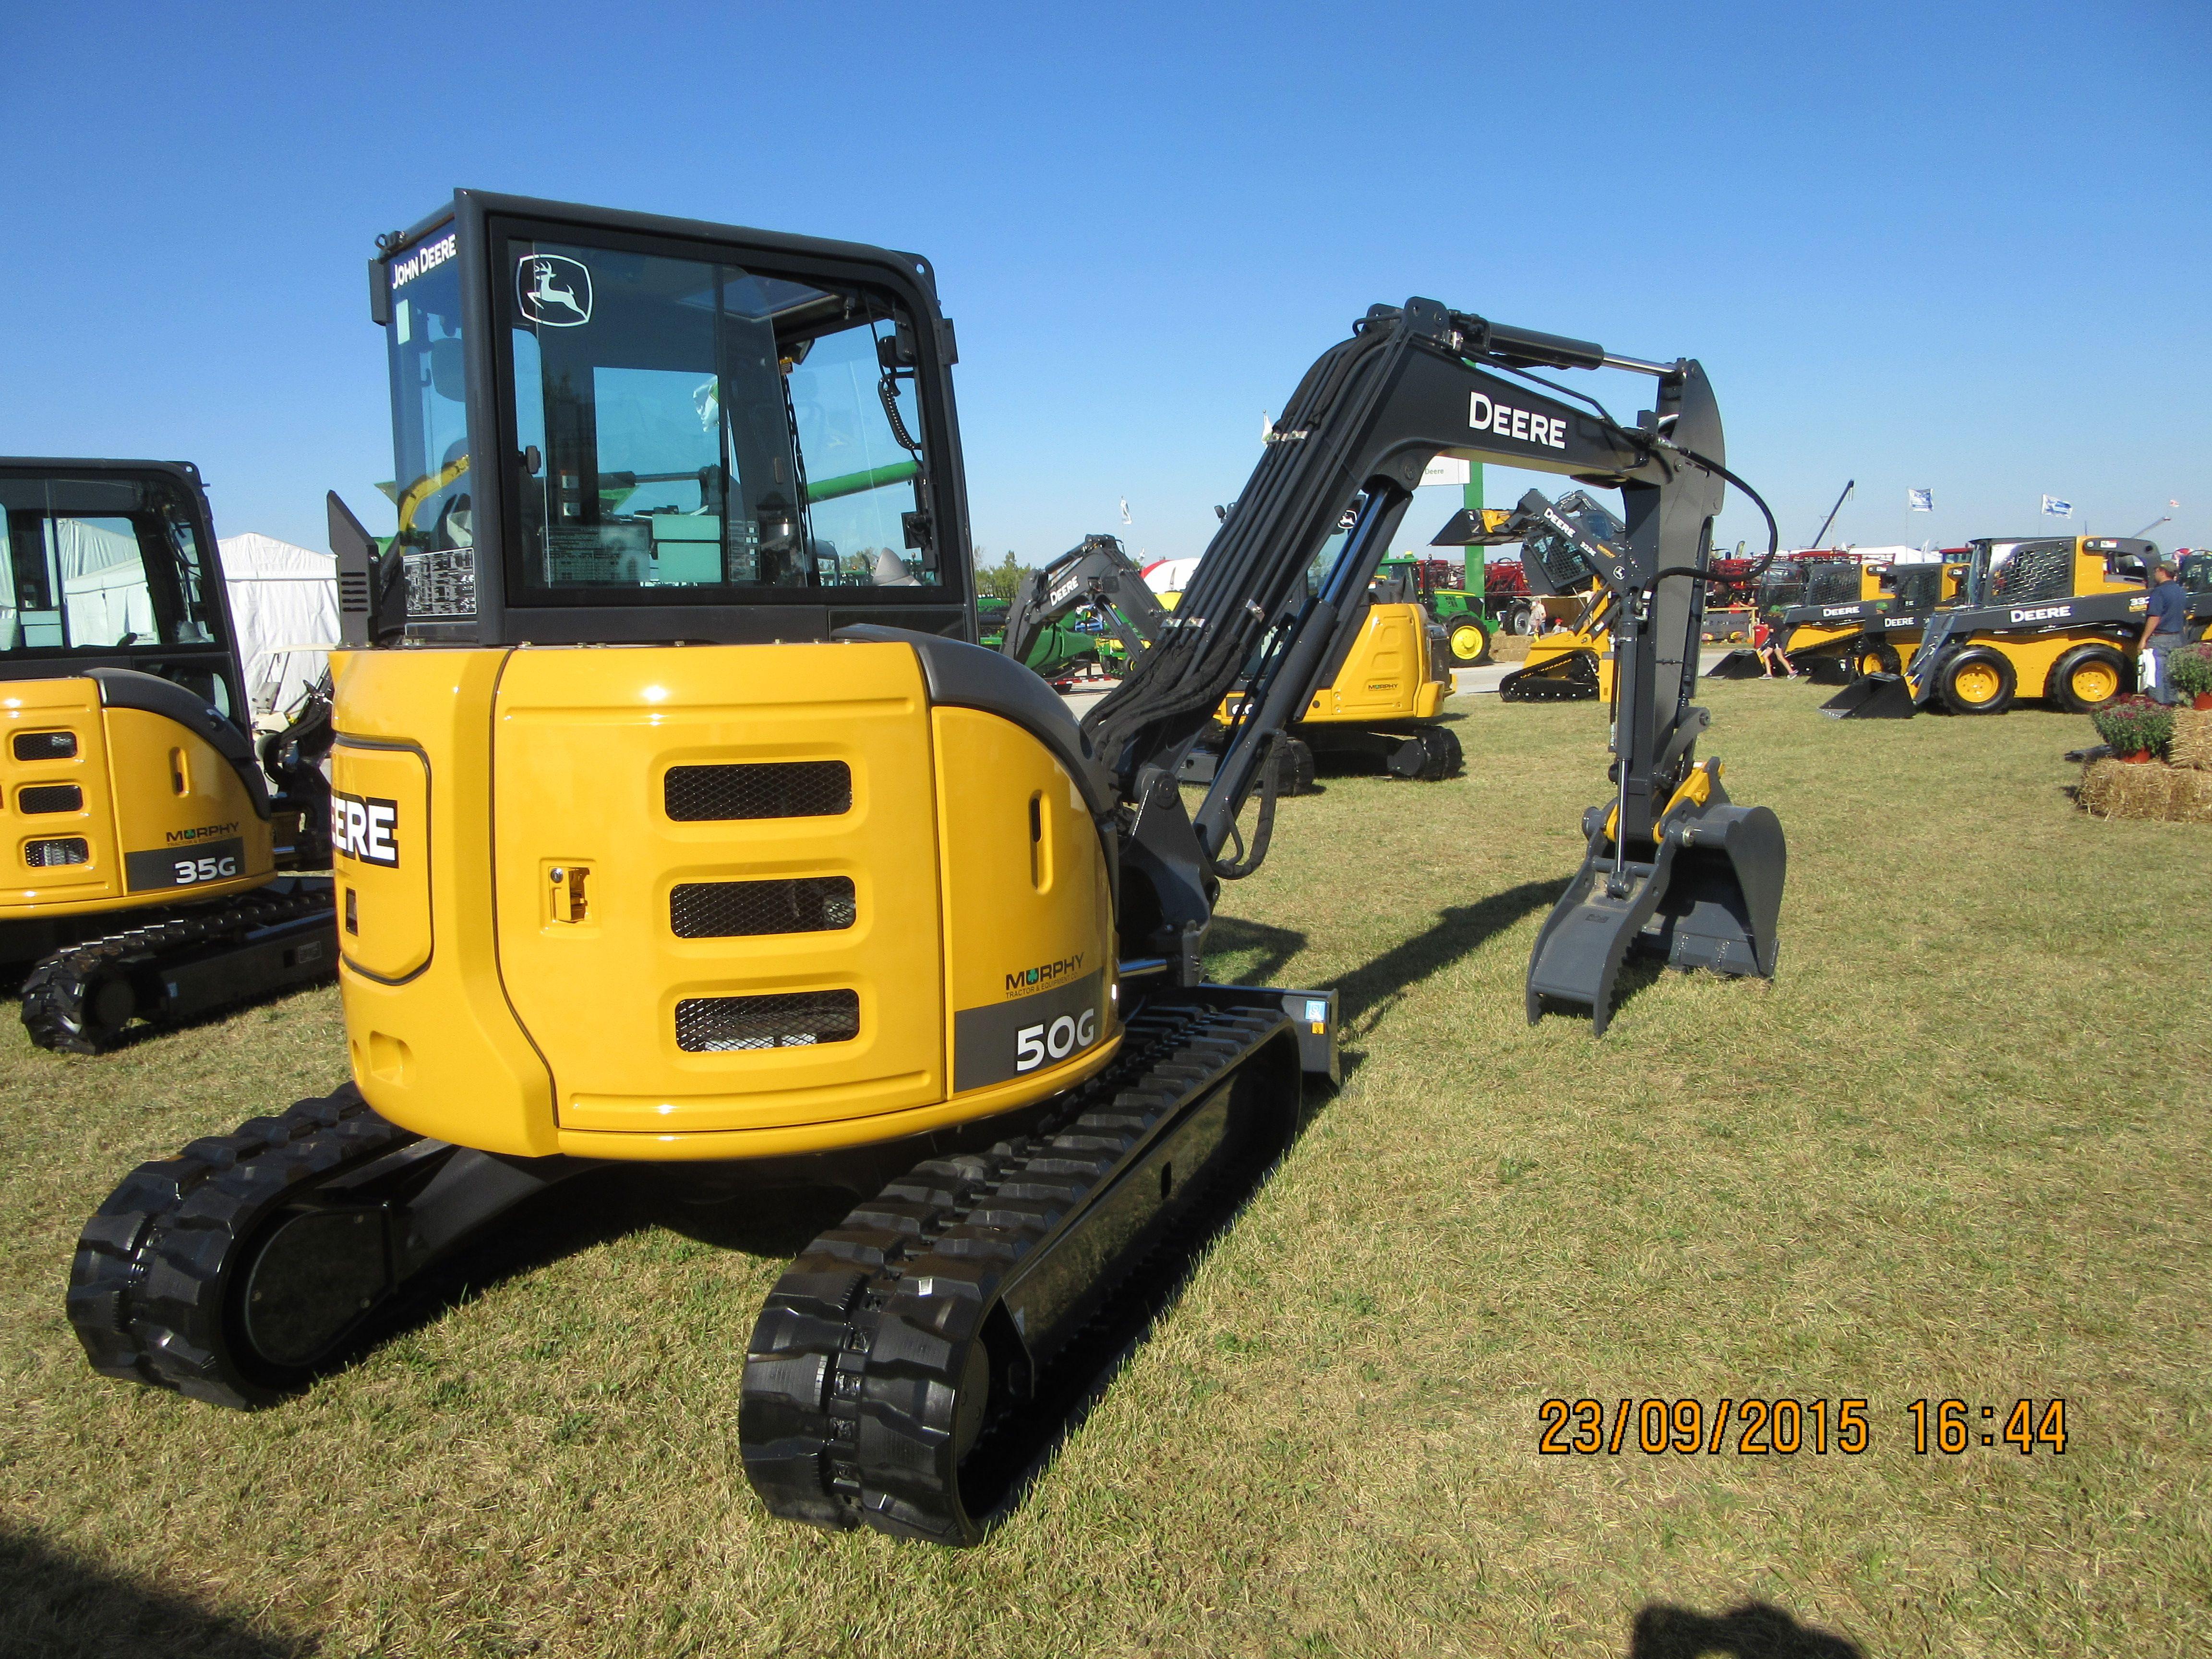 John Deere 50G | JD construction equipment | Heavy equipment